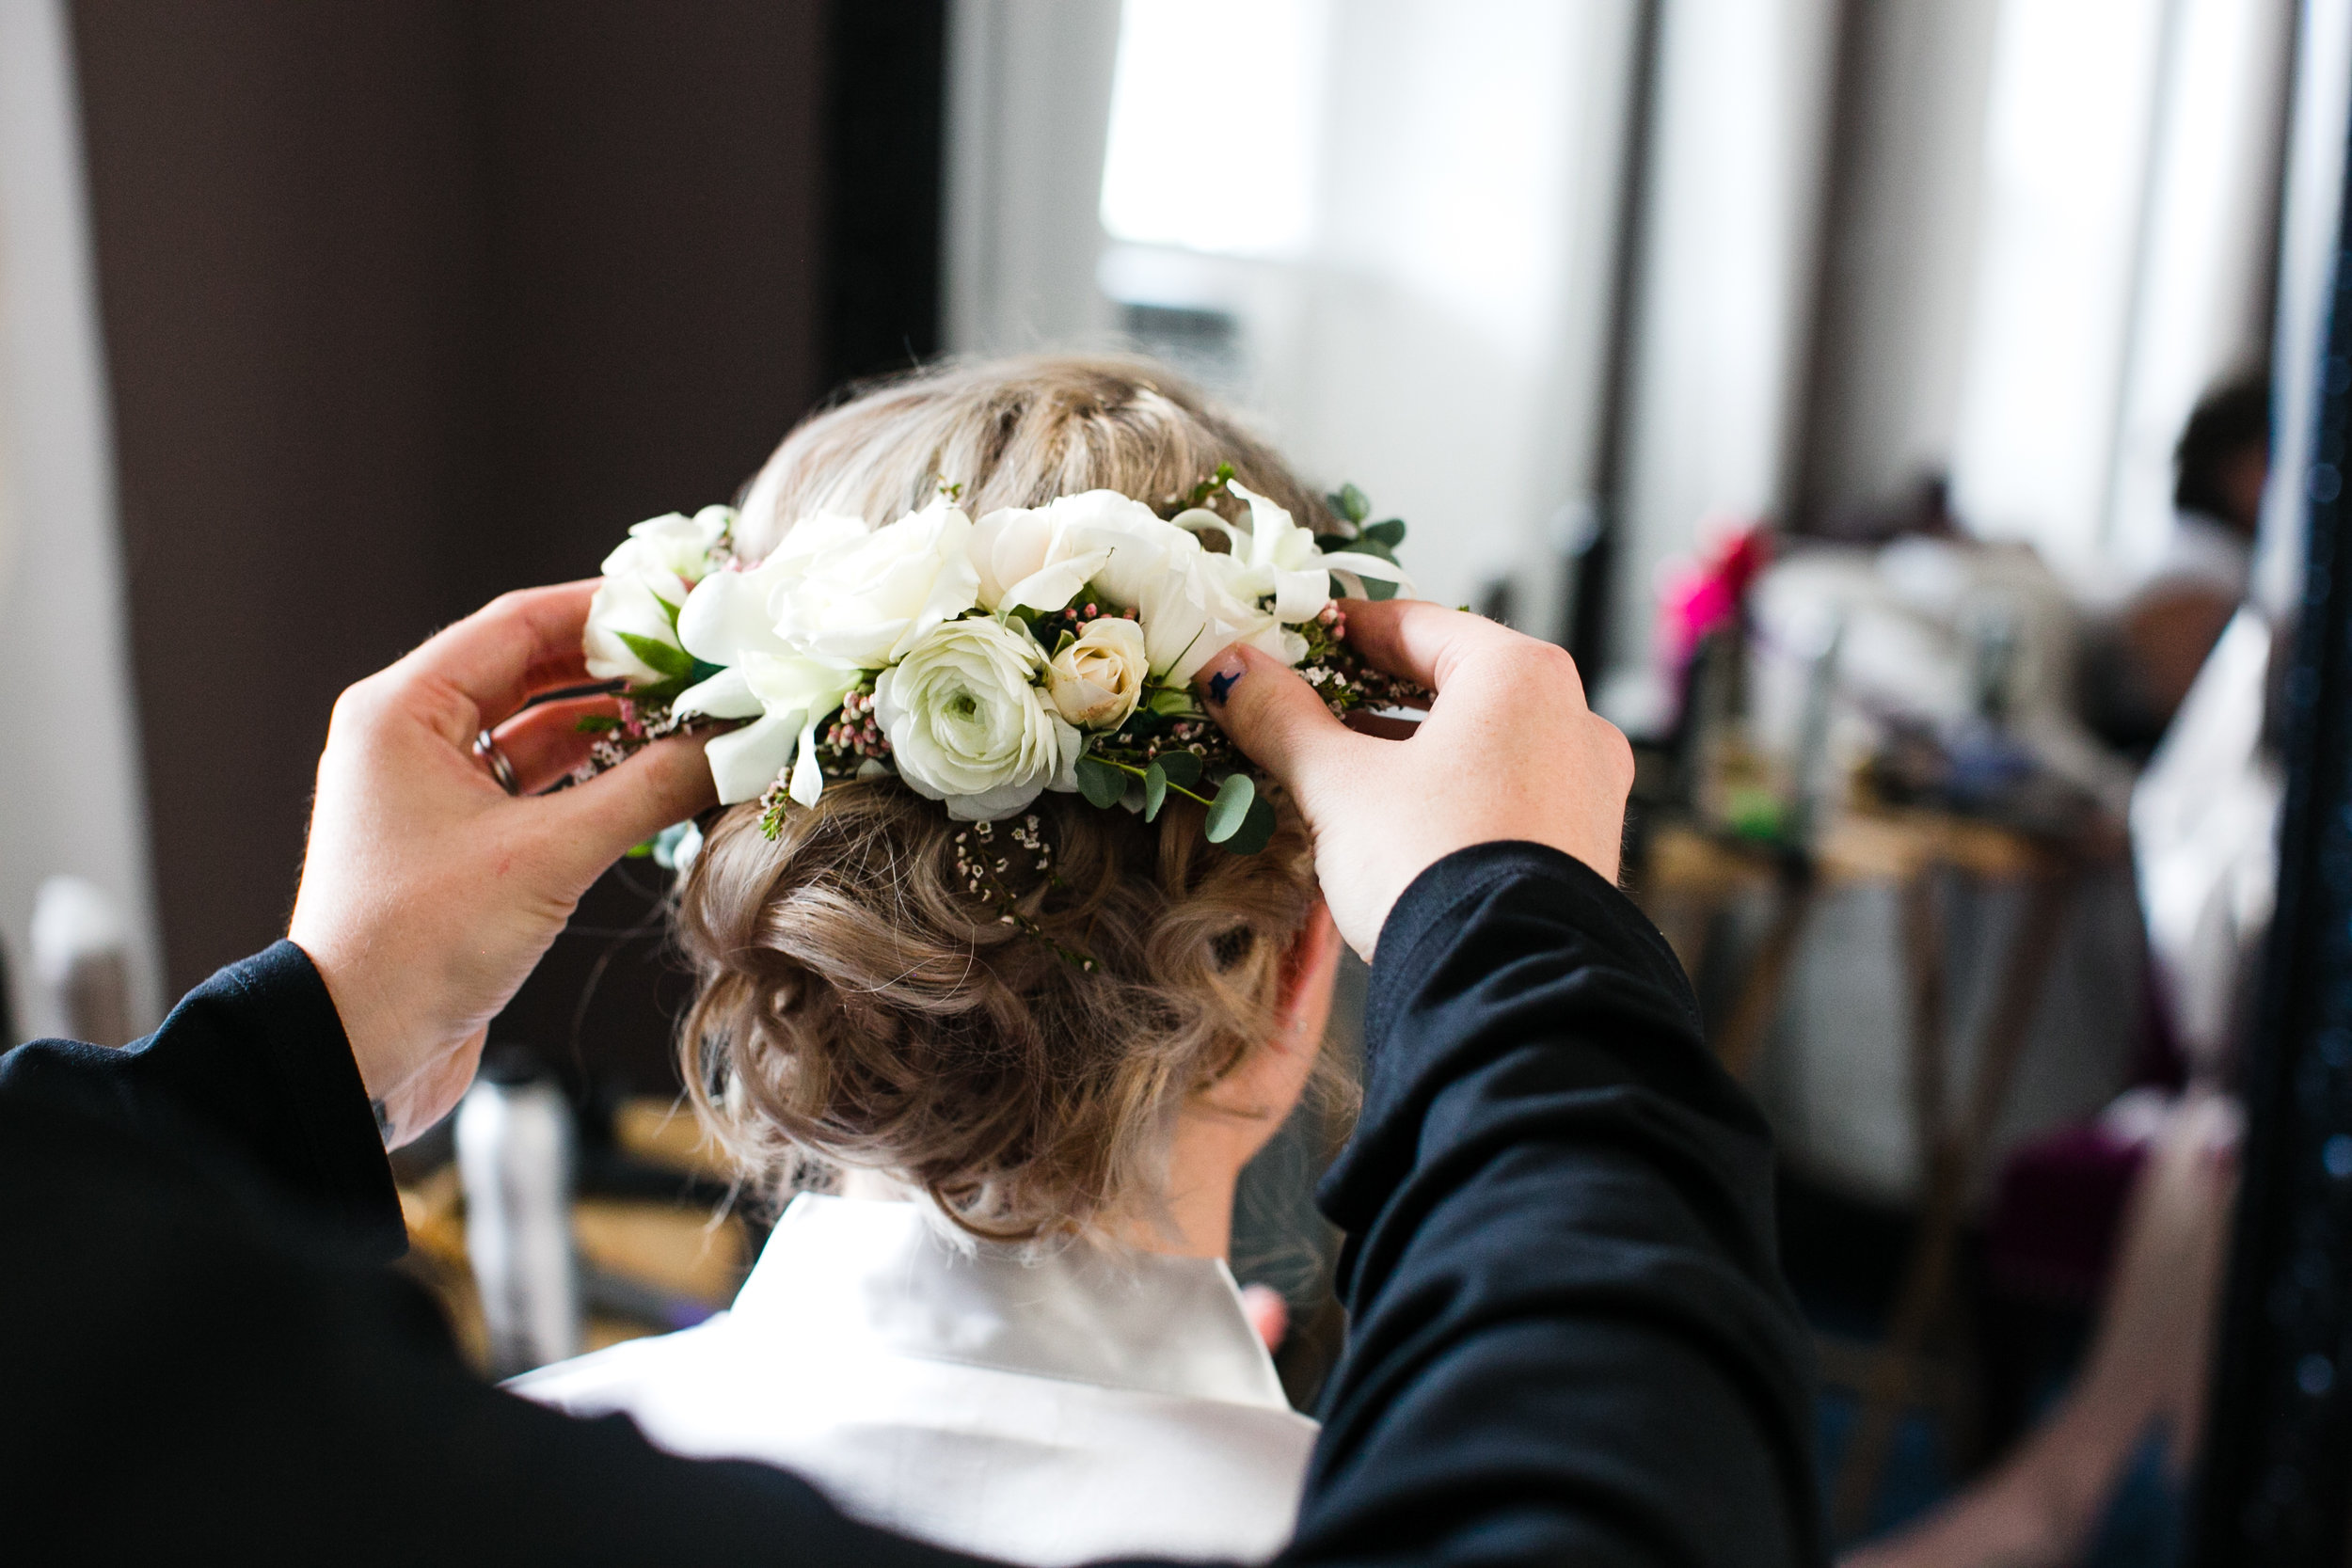 LA LUNA BANQUET HALL WEDDING BENSALEM - 013.jpg